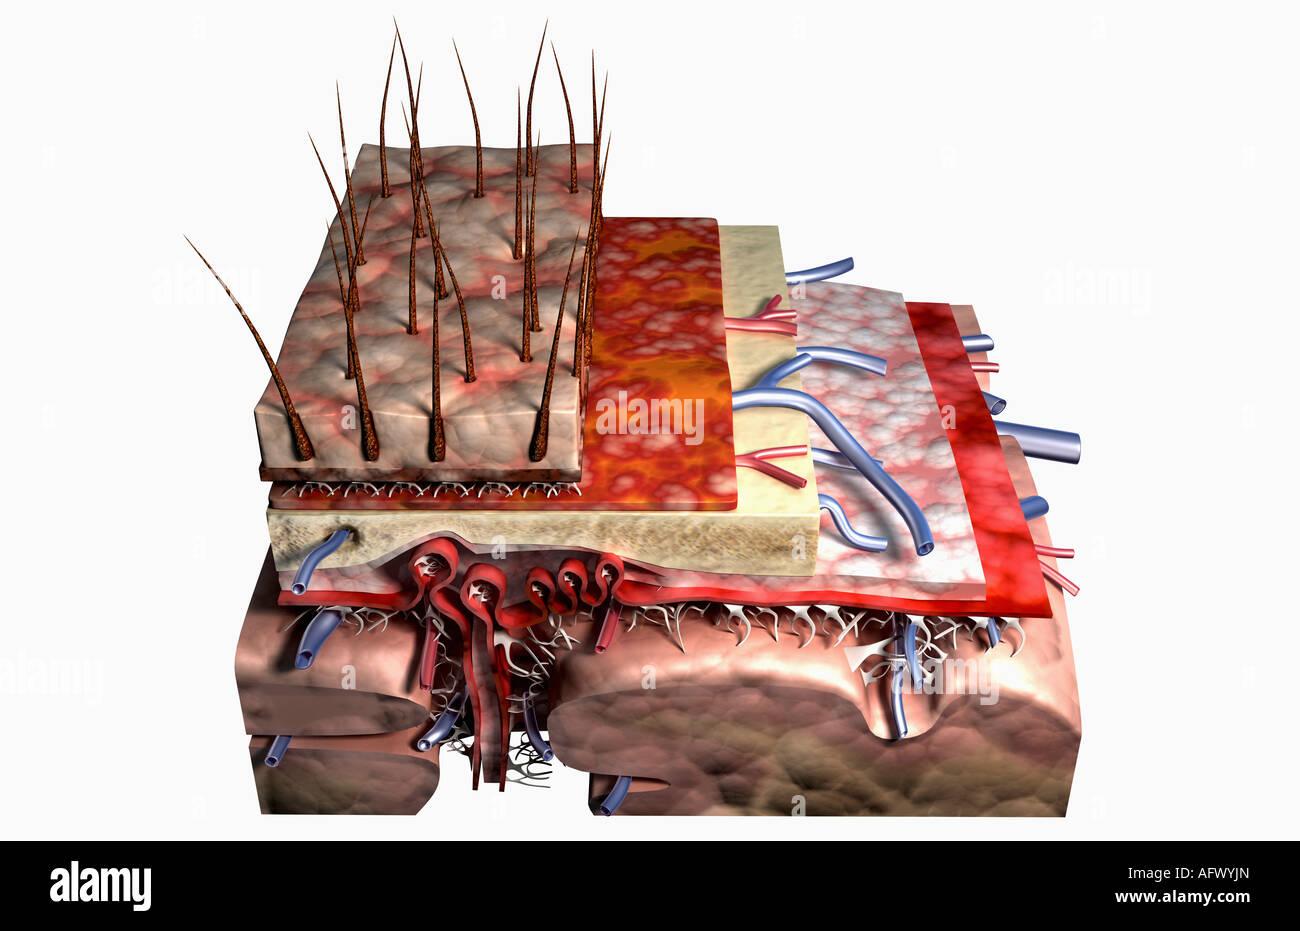 Sektionaltore Anatomie der Kopfhaut Stockfoto, Bild: 14030348 - Alamy